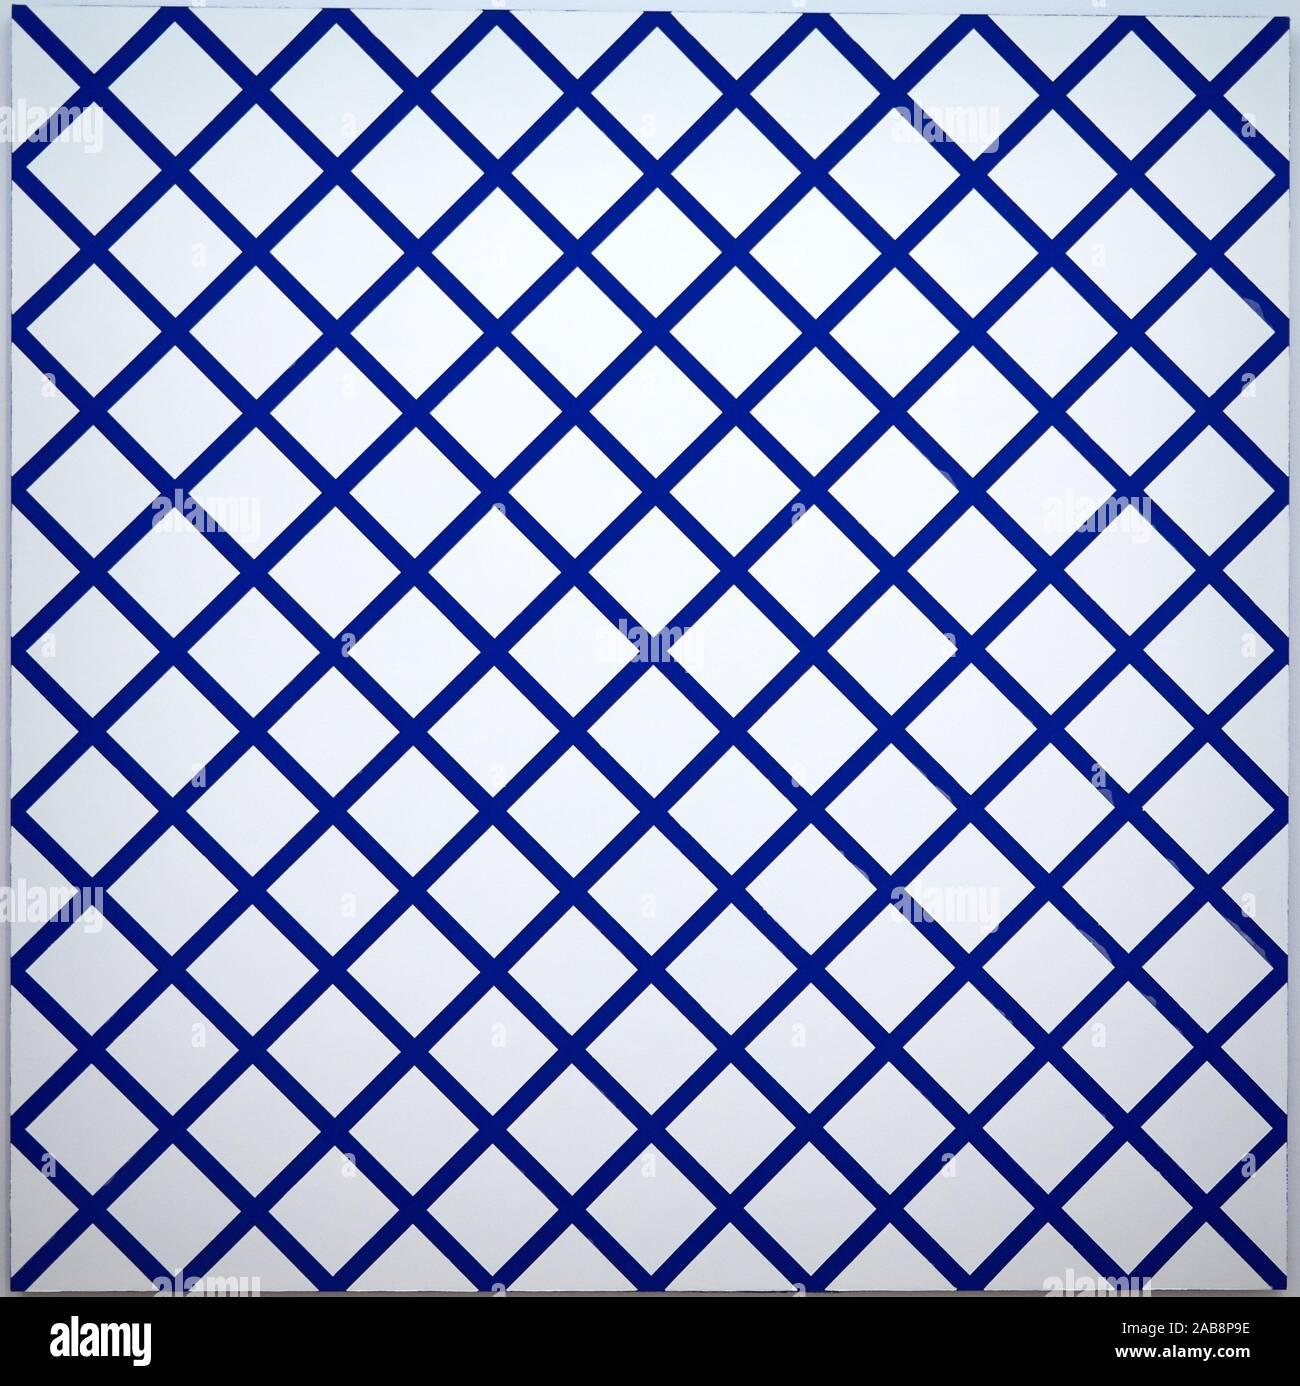 """""""Untitled"""", 2004, Heimo Zobernig, Centre Pompidou, Paris, France, Europe Stock Photo"